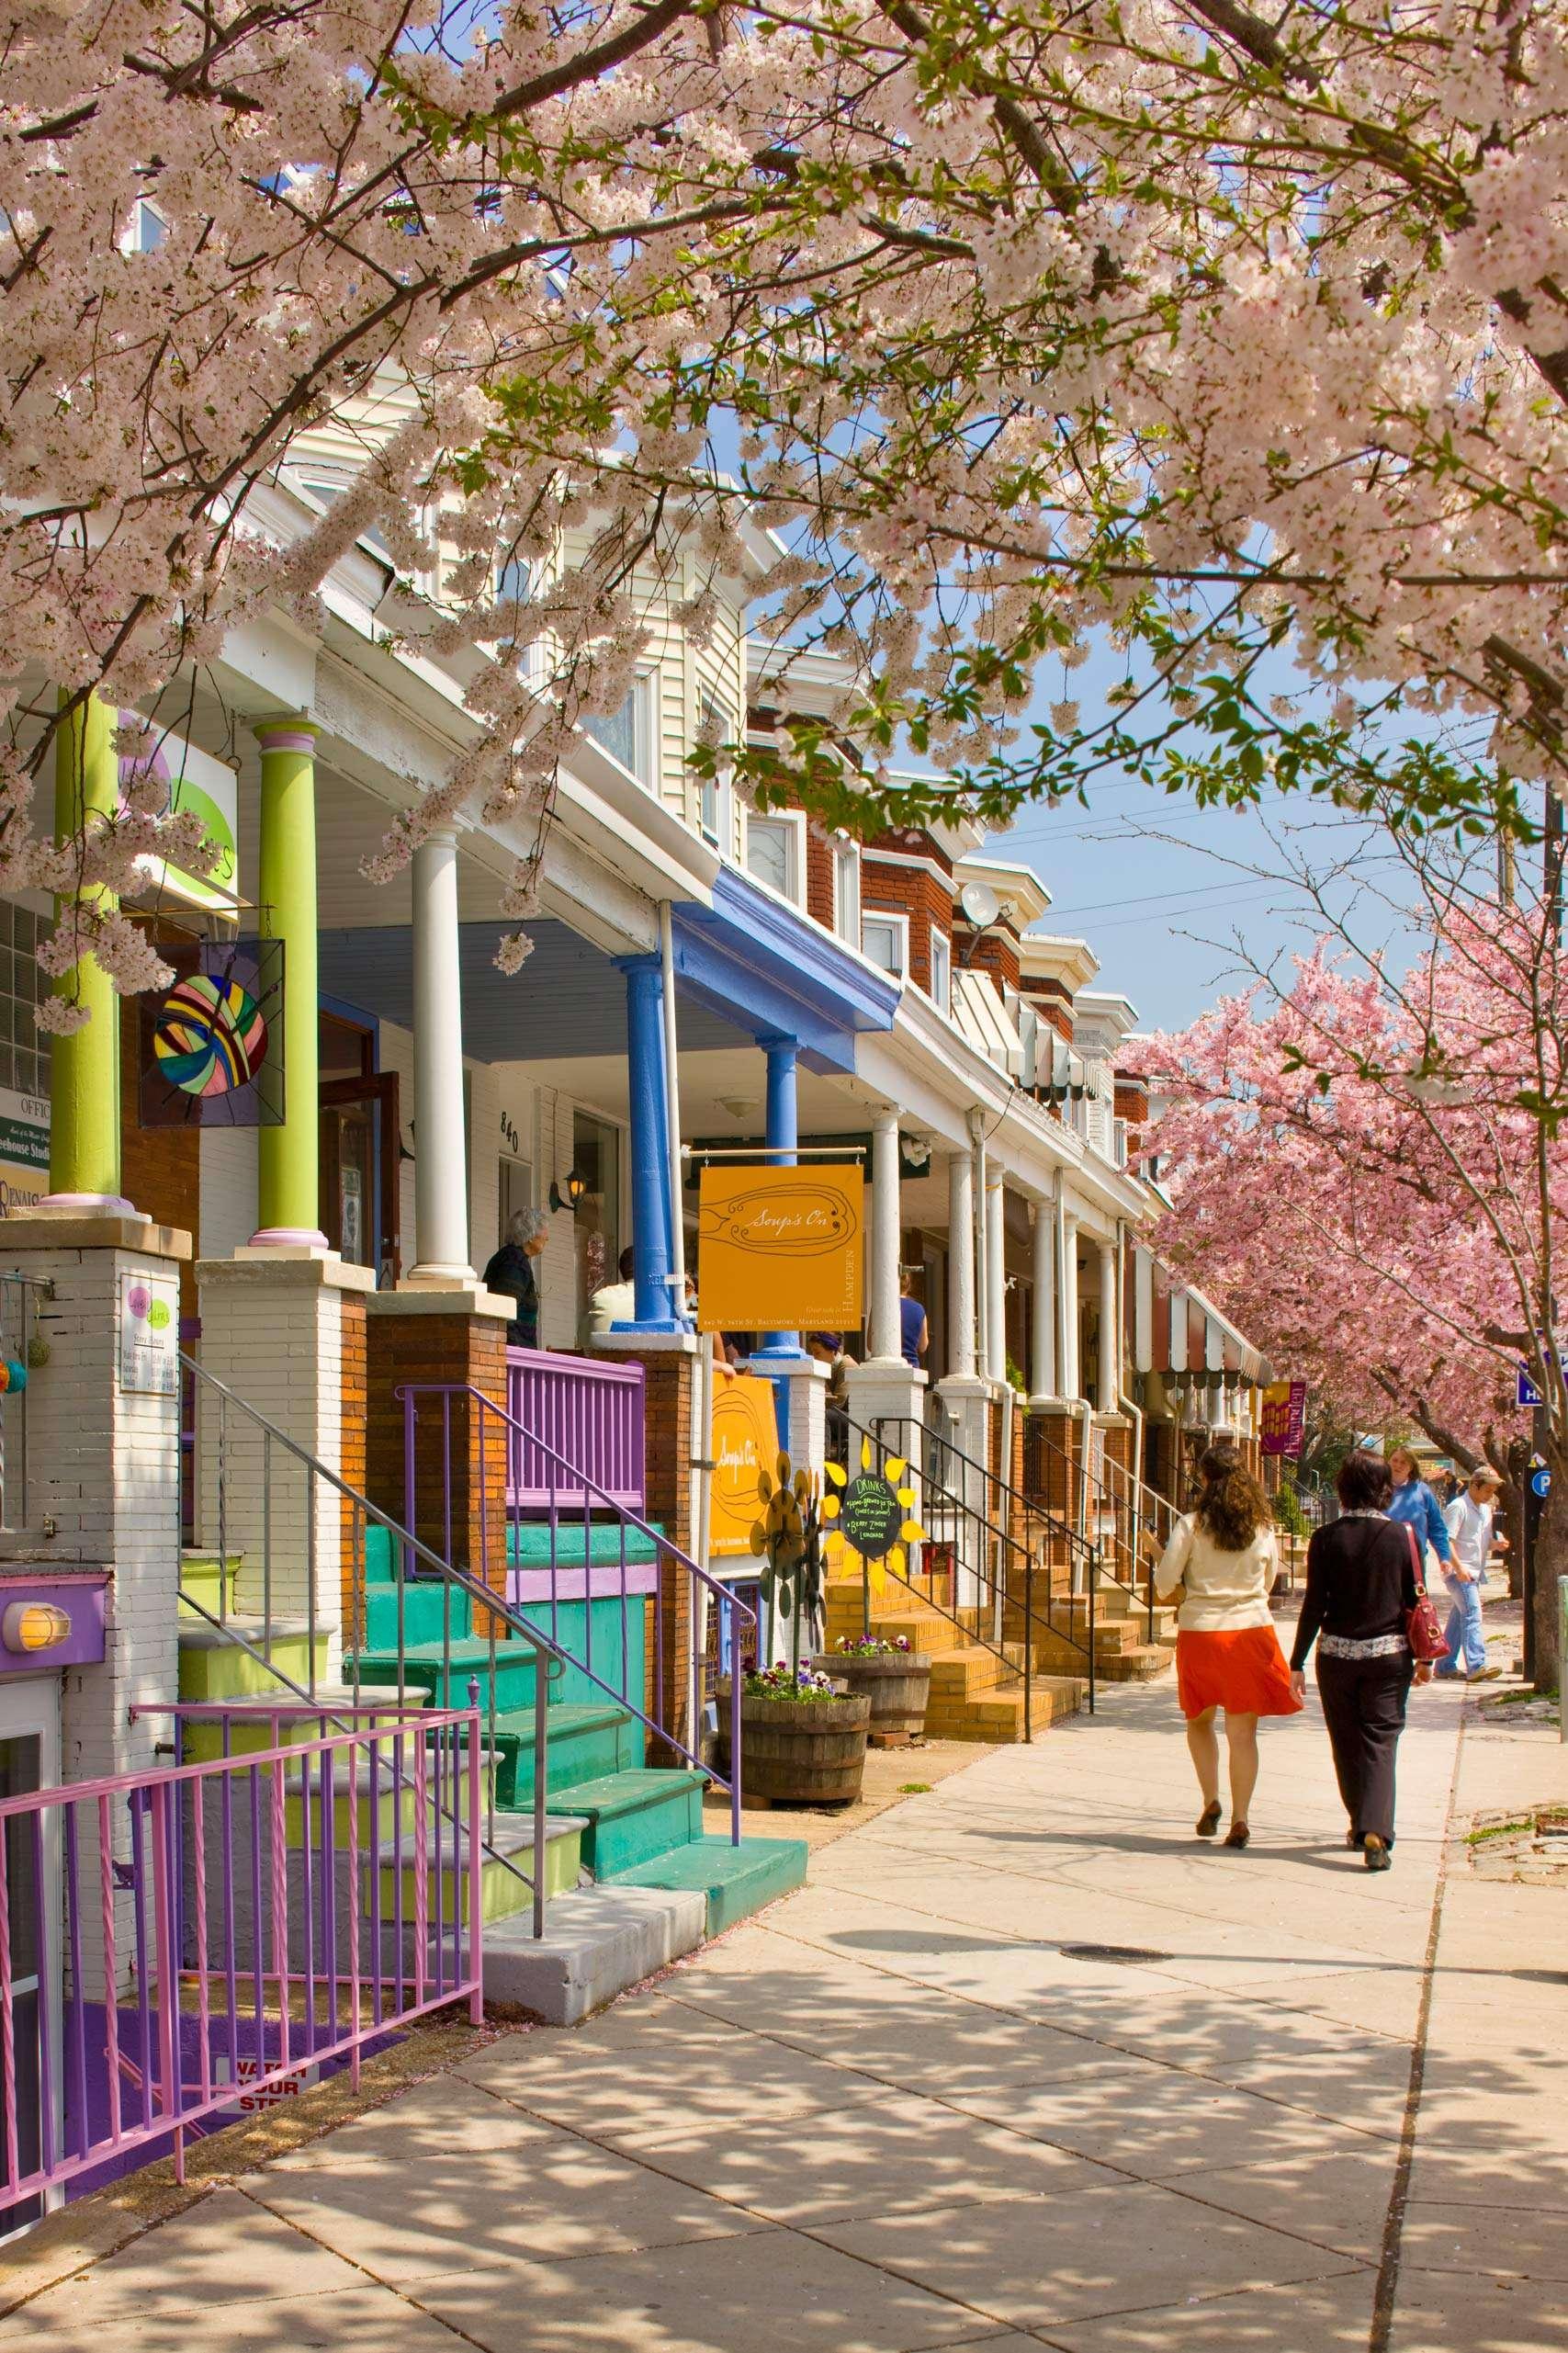 PORTFOLIO - Baltimore - Neighborhoods #15